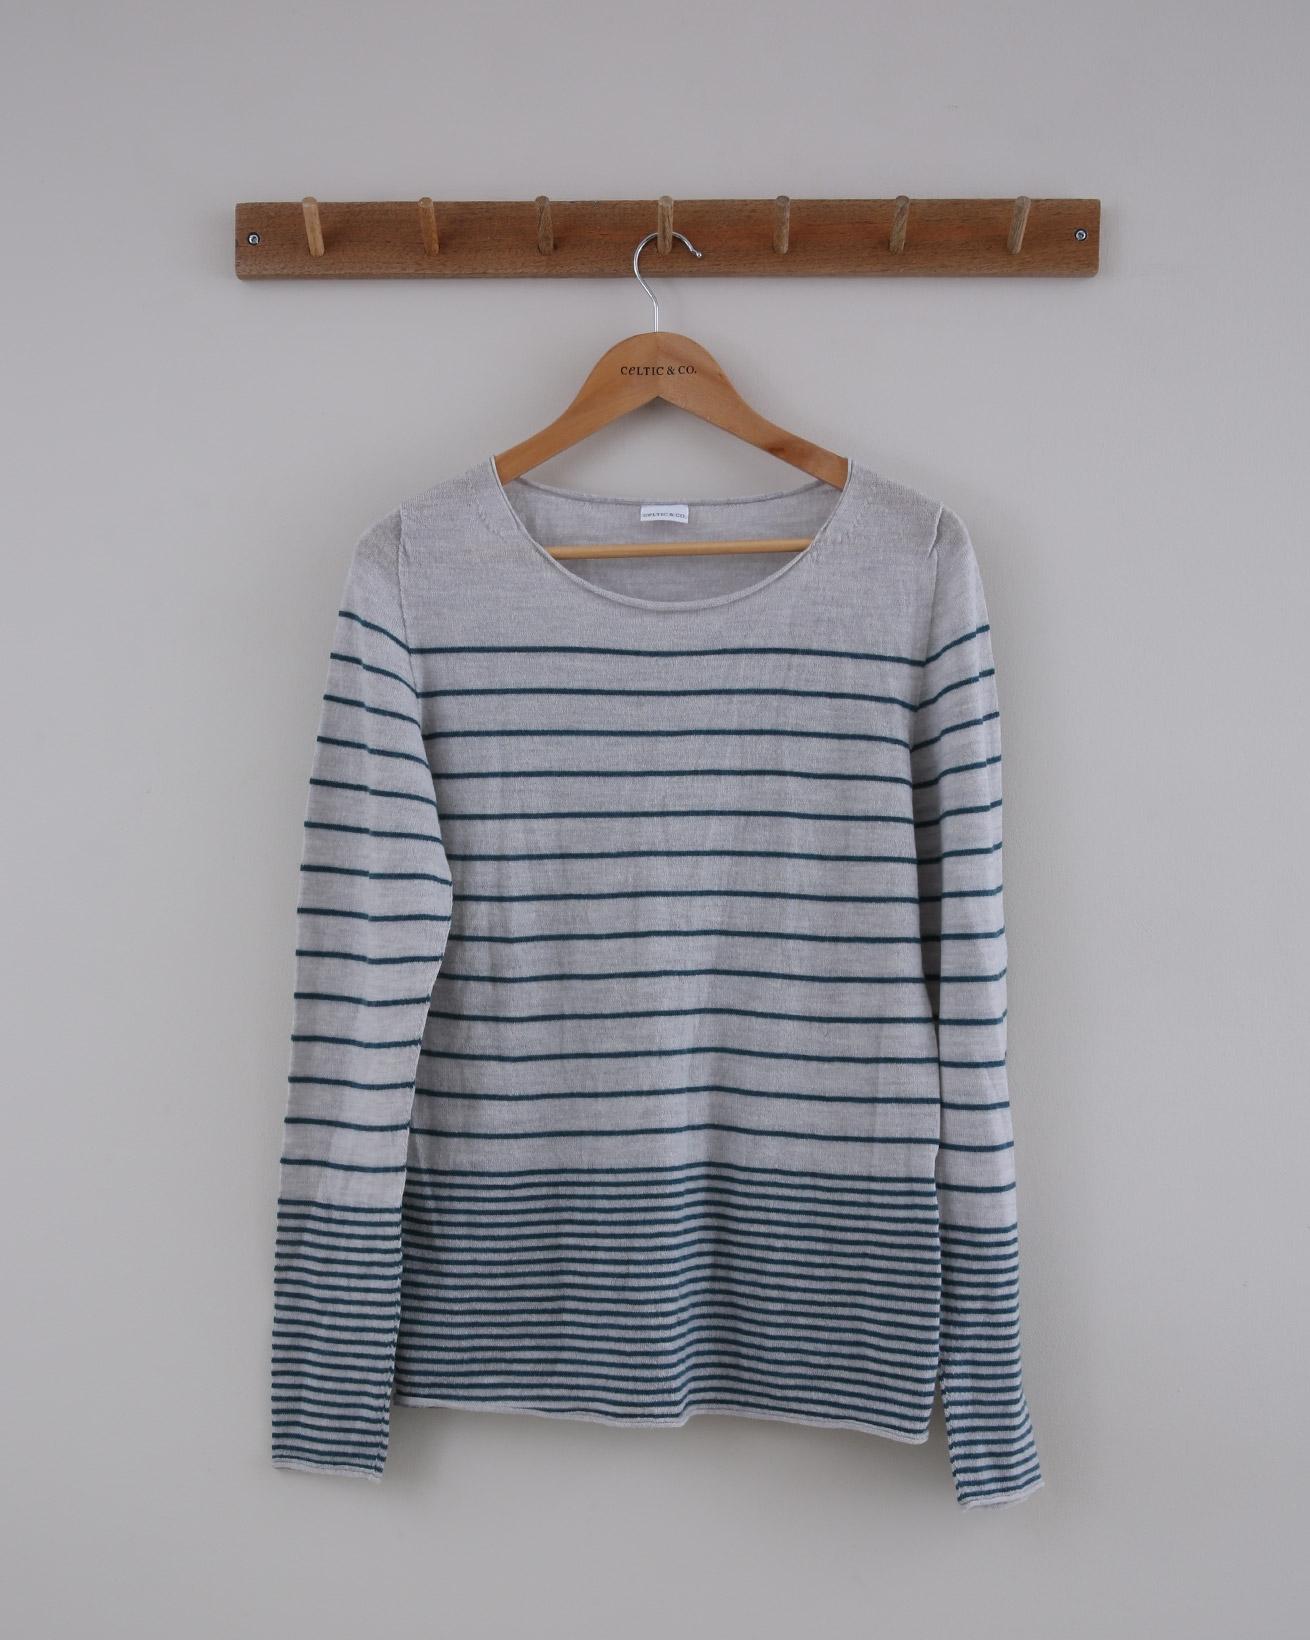 Fine Knit Merino Crew-neck - Small - Grey Teal Stripe - 1452